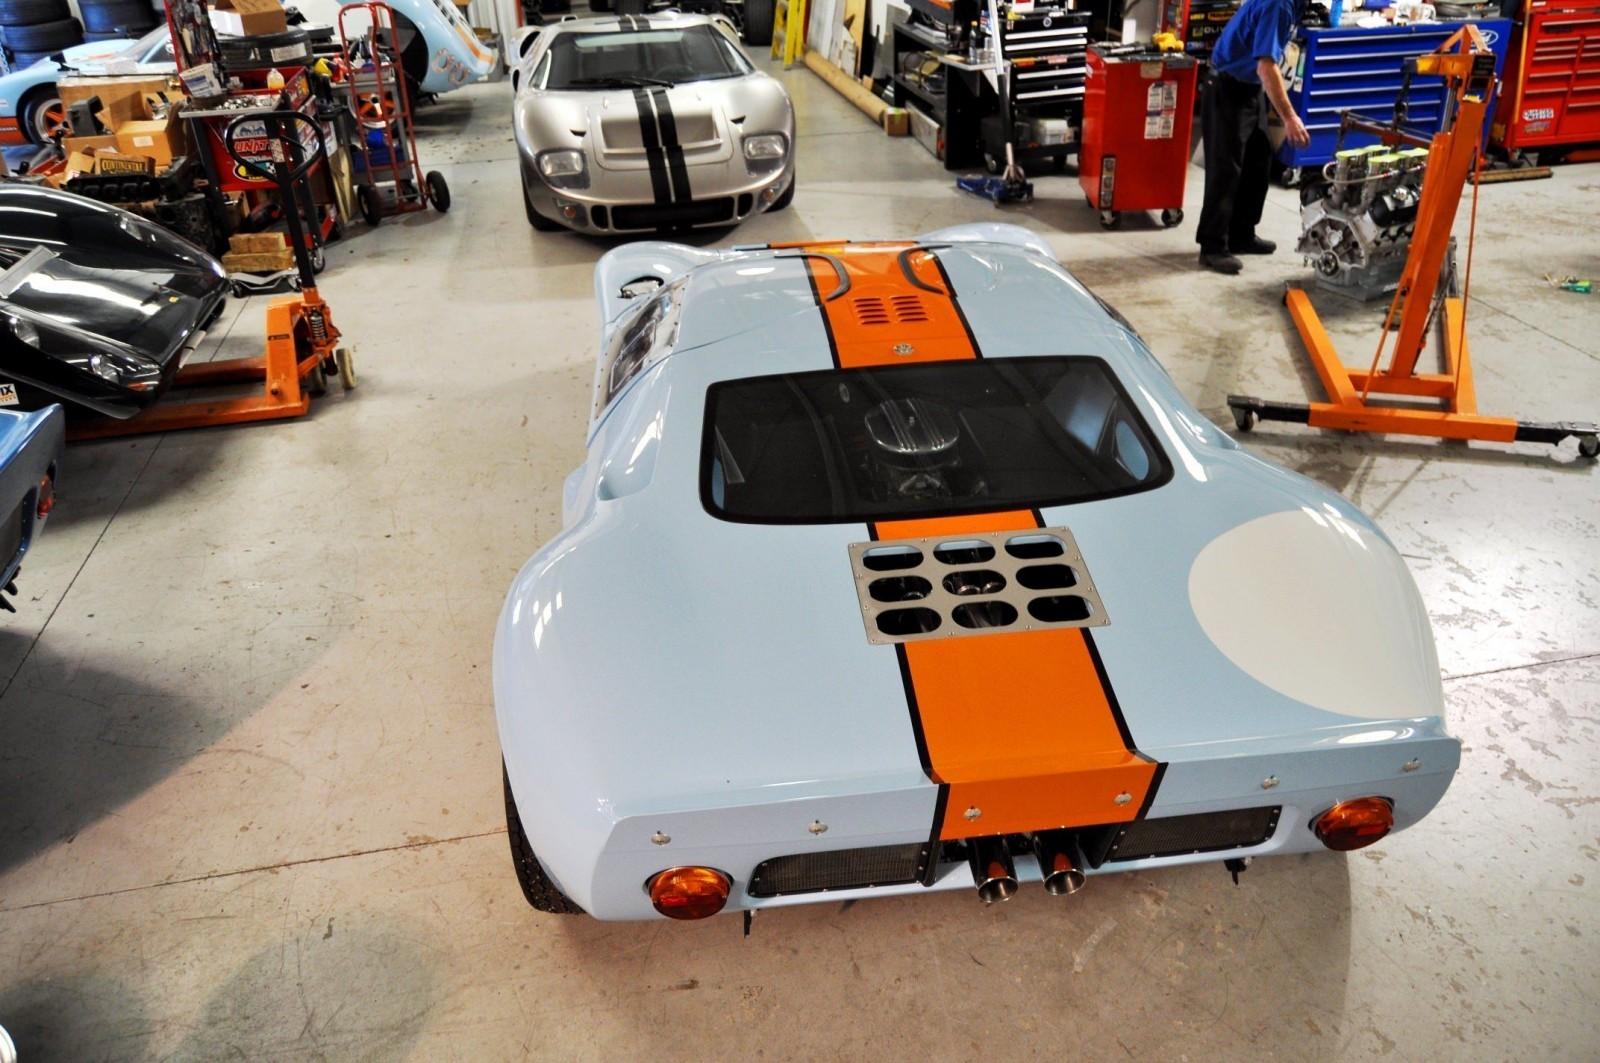 2014 Superformance GT40 Mark I - MEGA Photo Shoot and Ride-Along Videos 42